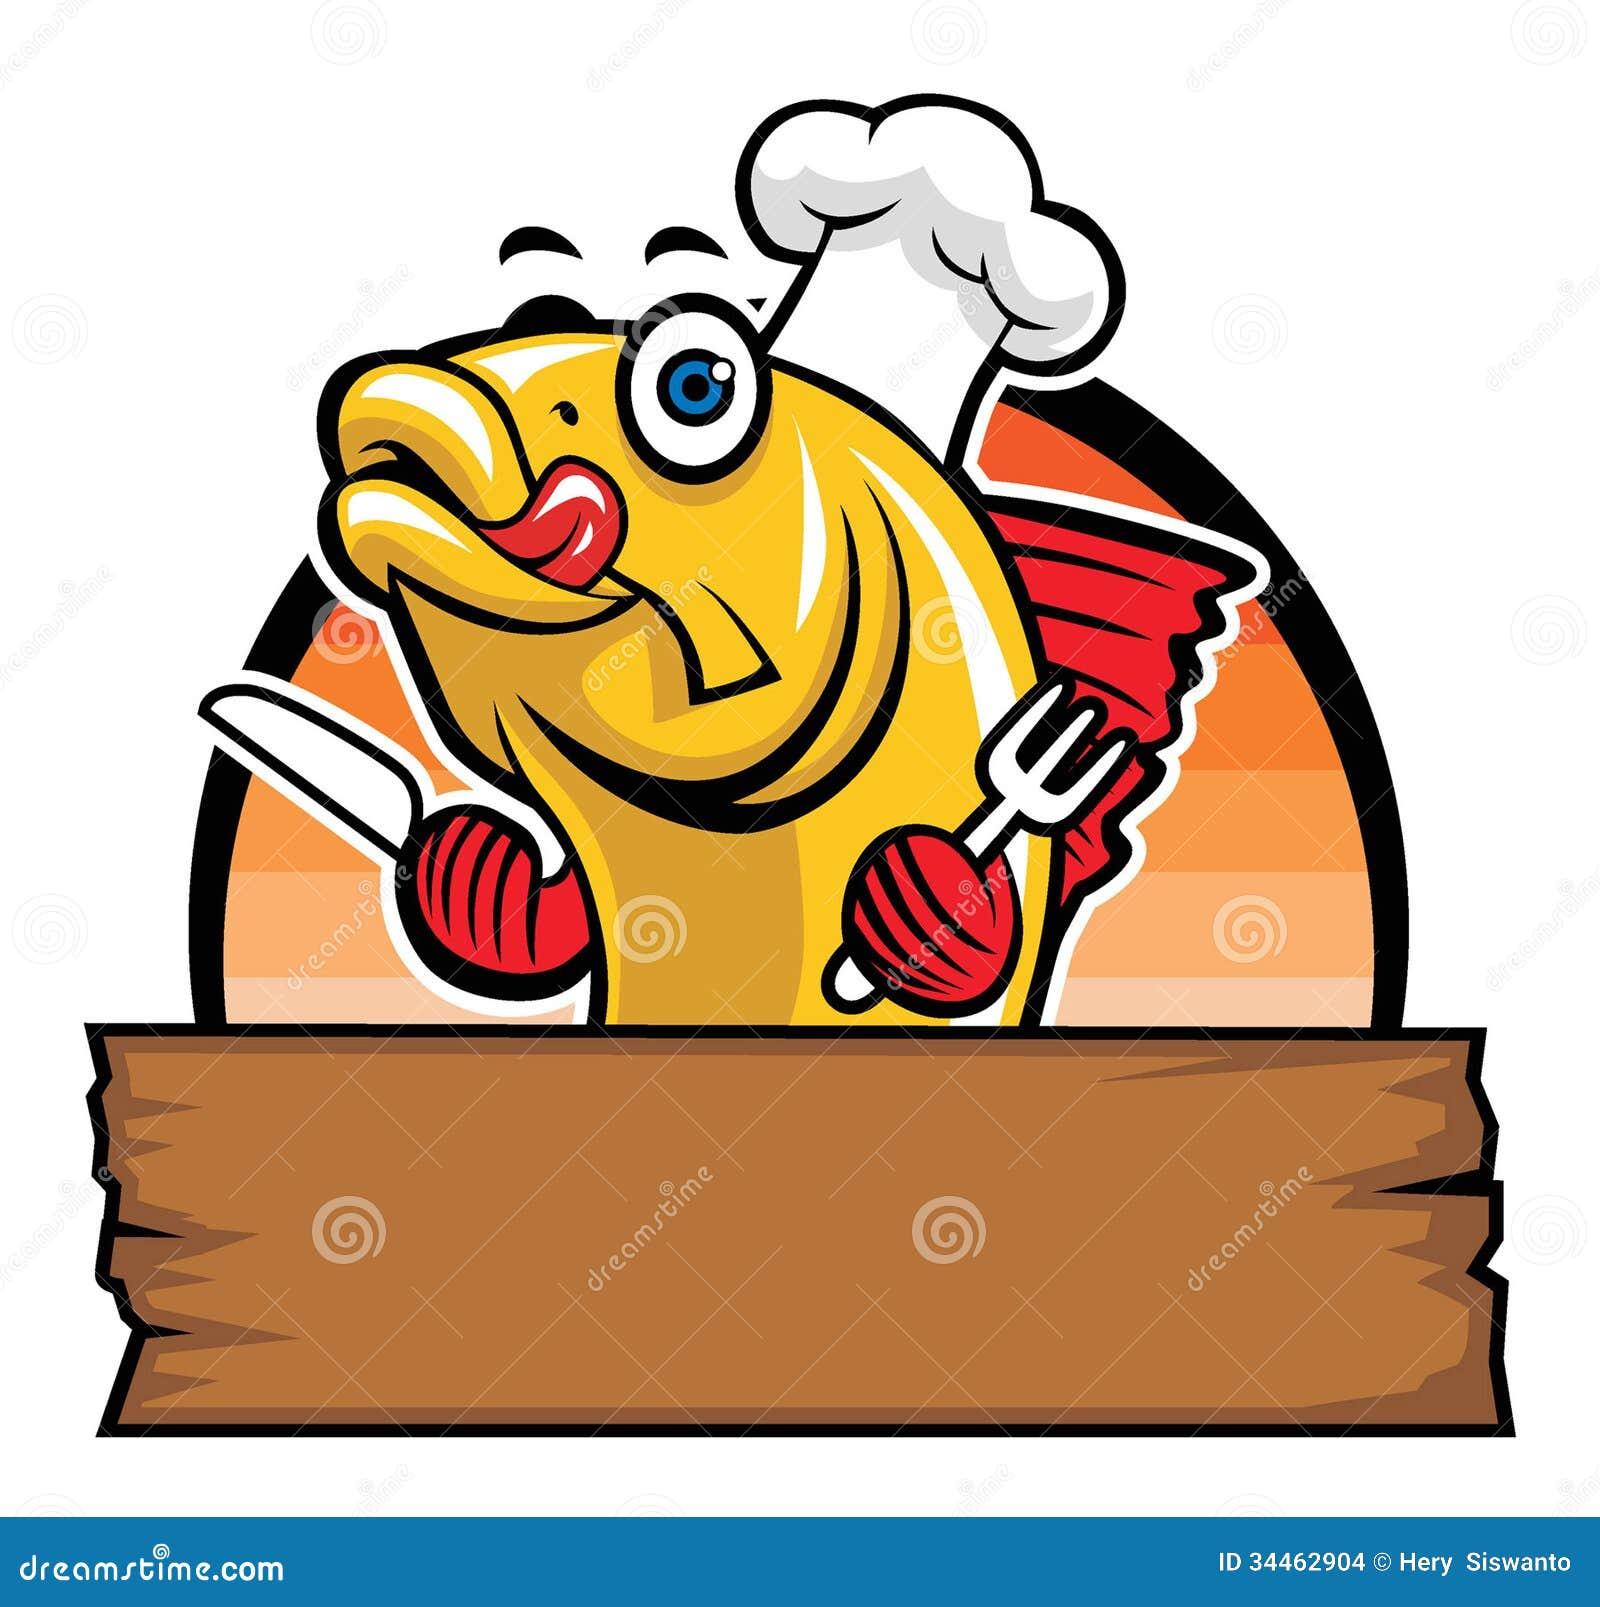 Cartoon restaurant free vector graphic download - Cartoon Chef Fish Mascot Restaurant